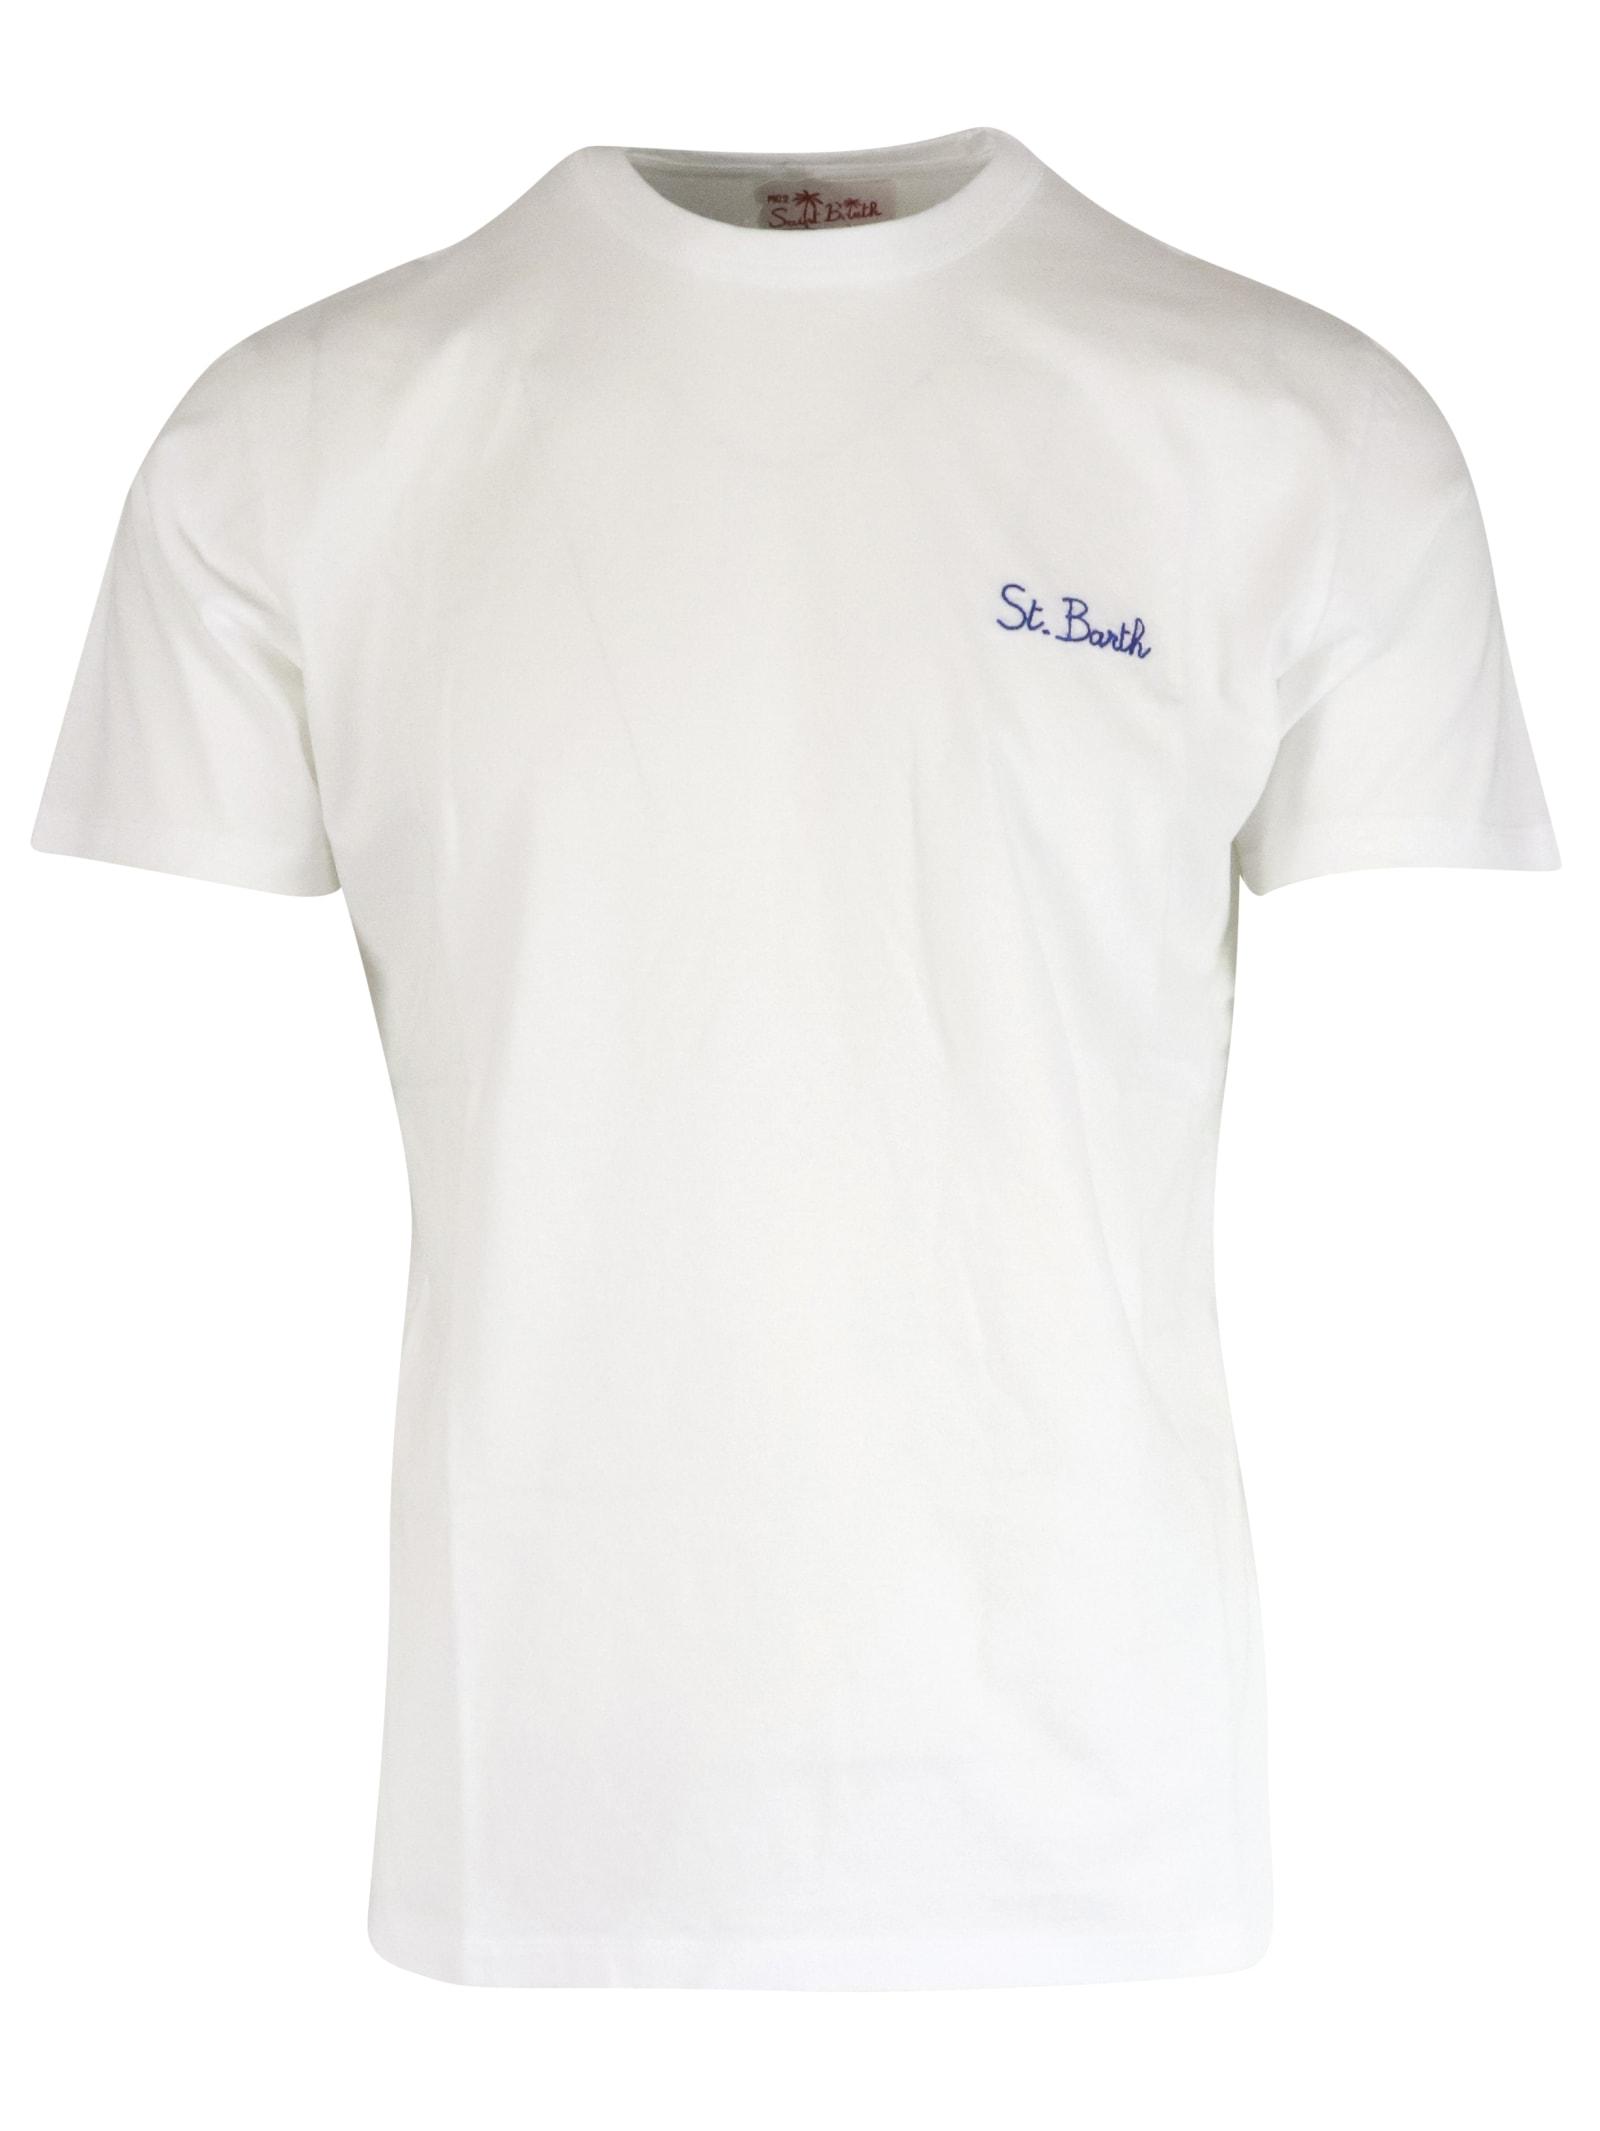 MC2 Saint Barth T Shirt Garment Dyed T-shirt